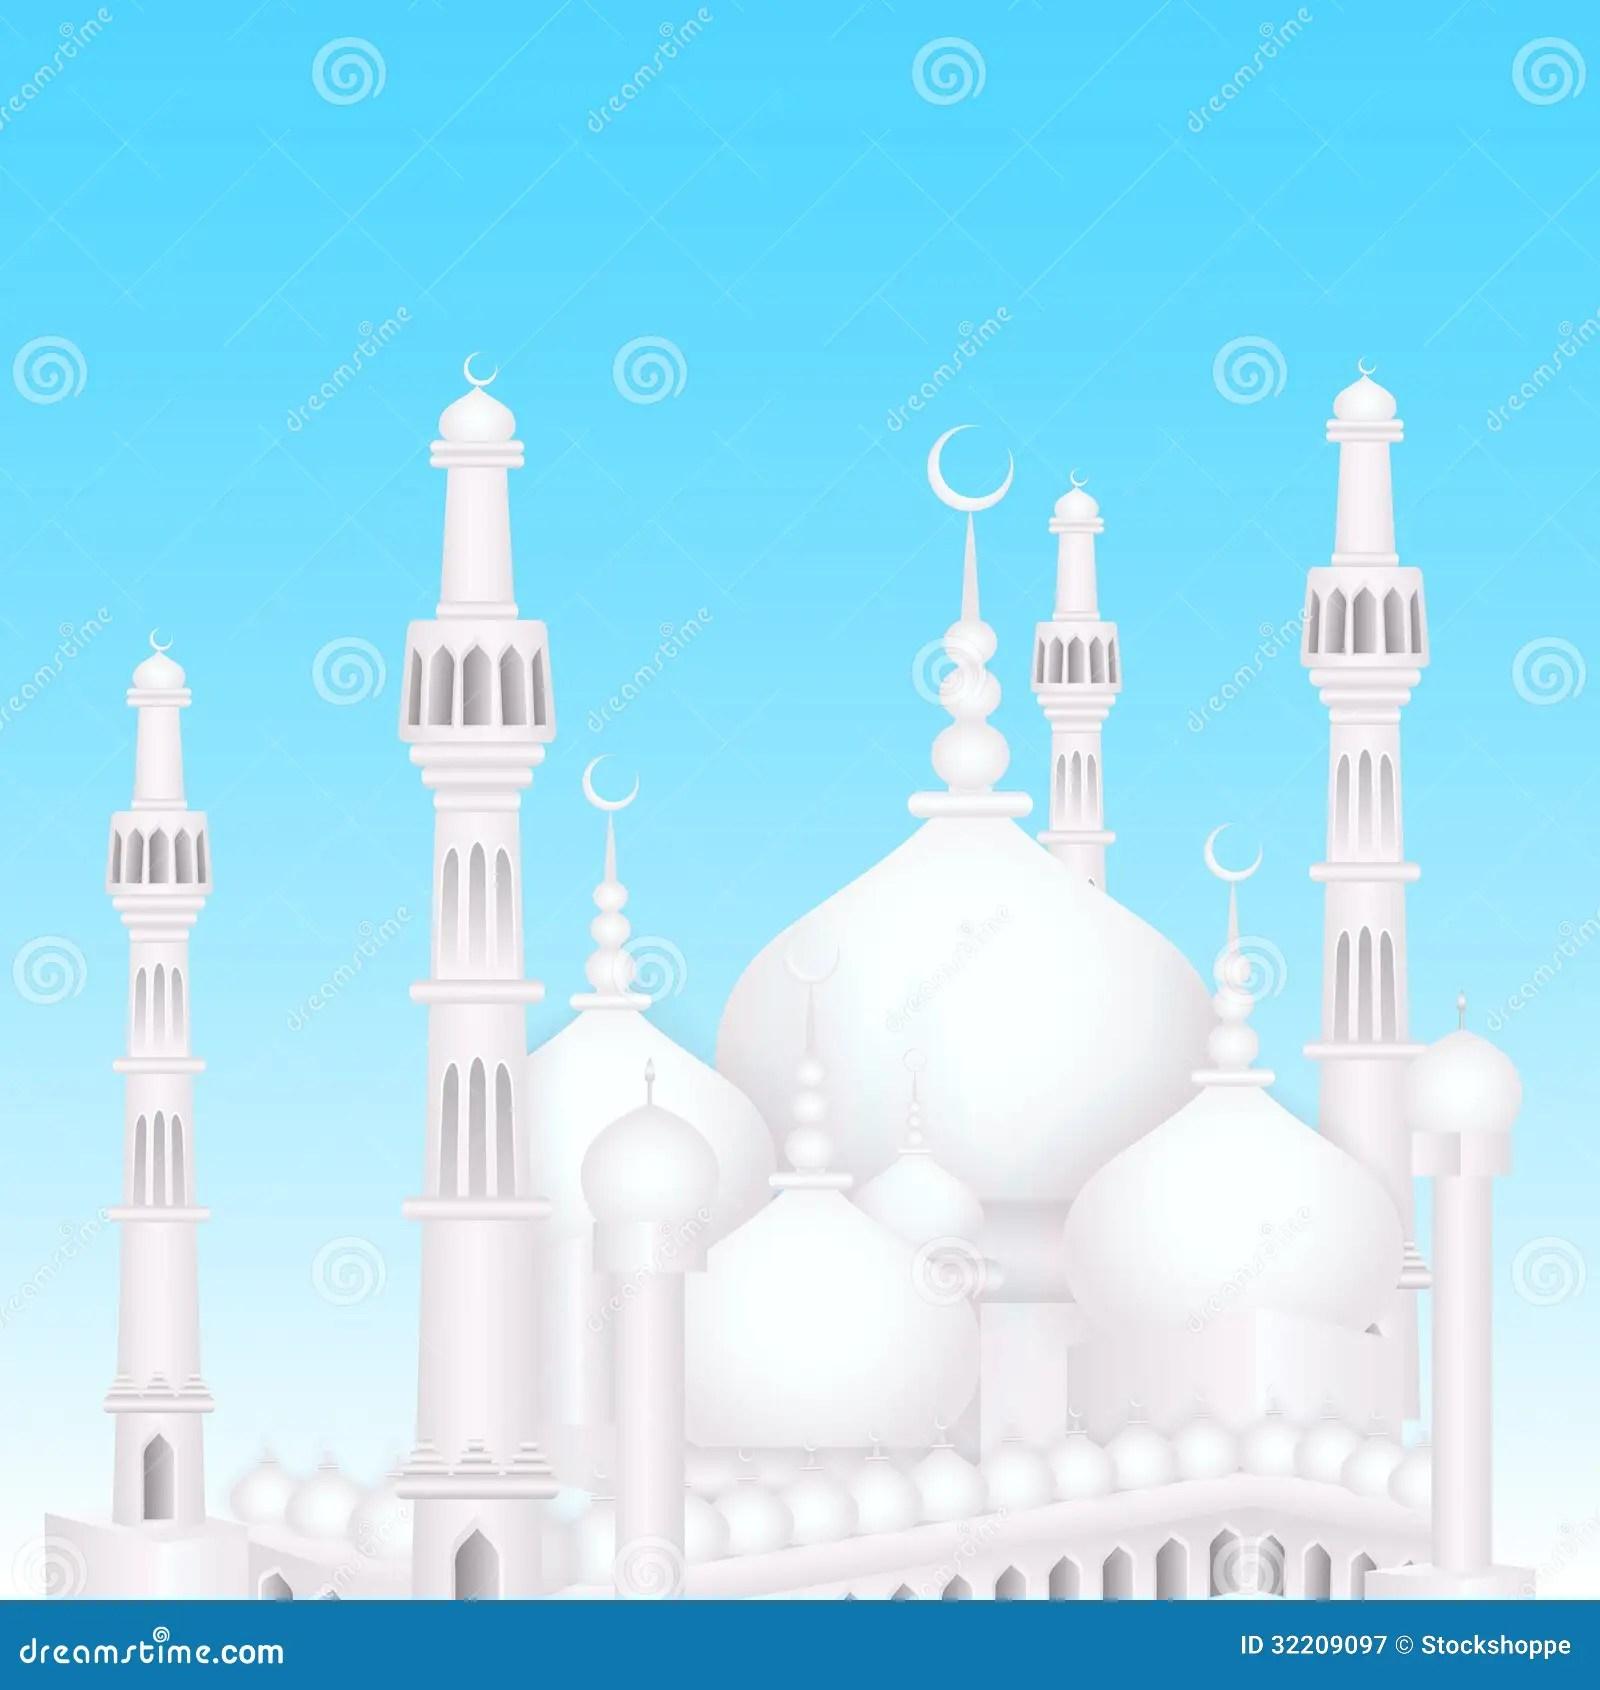 Wallpaper Hd Muslim Eid Mubarak Background With Islamic Mosque Stock Vector